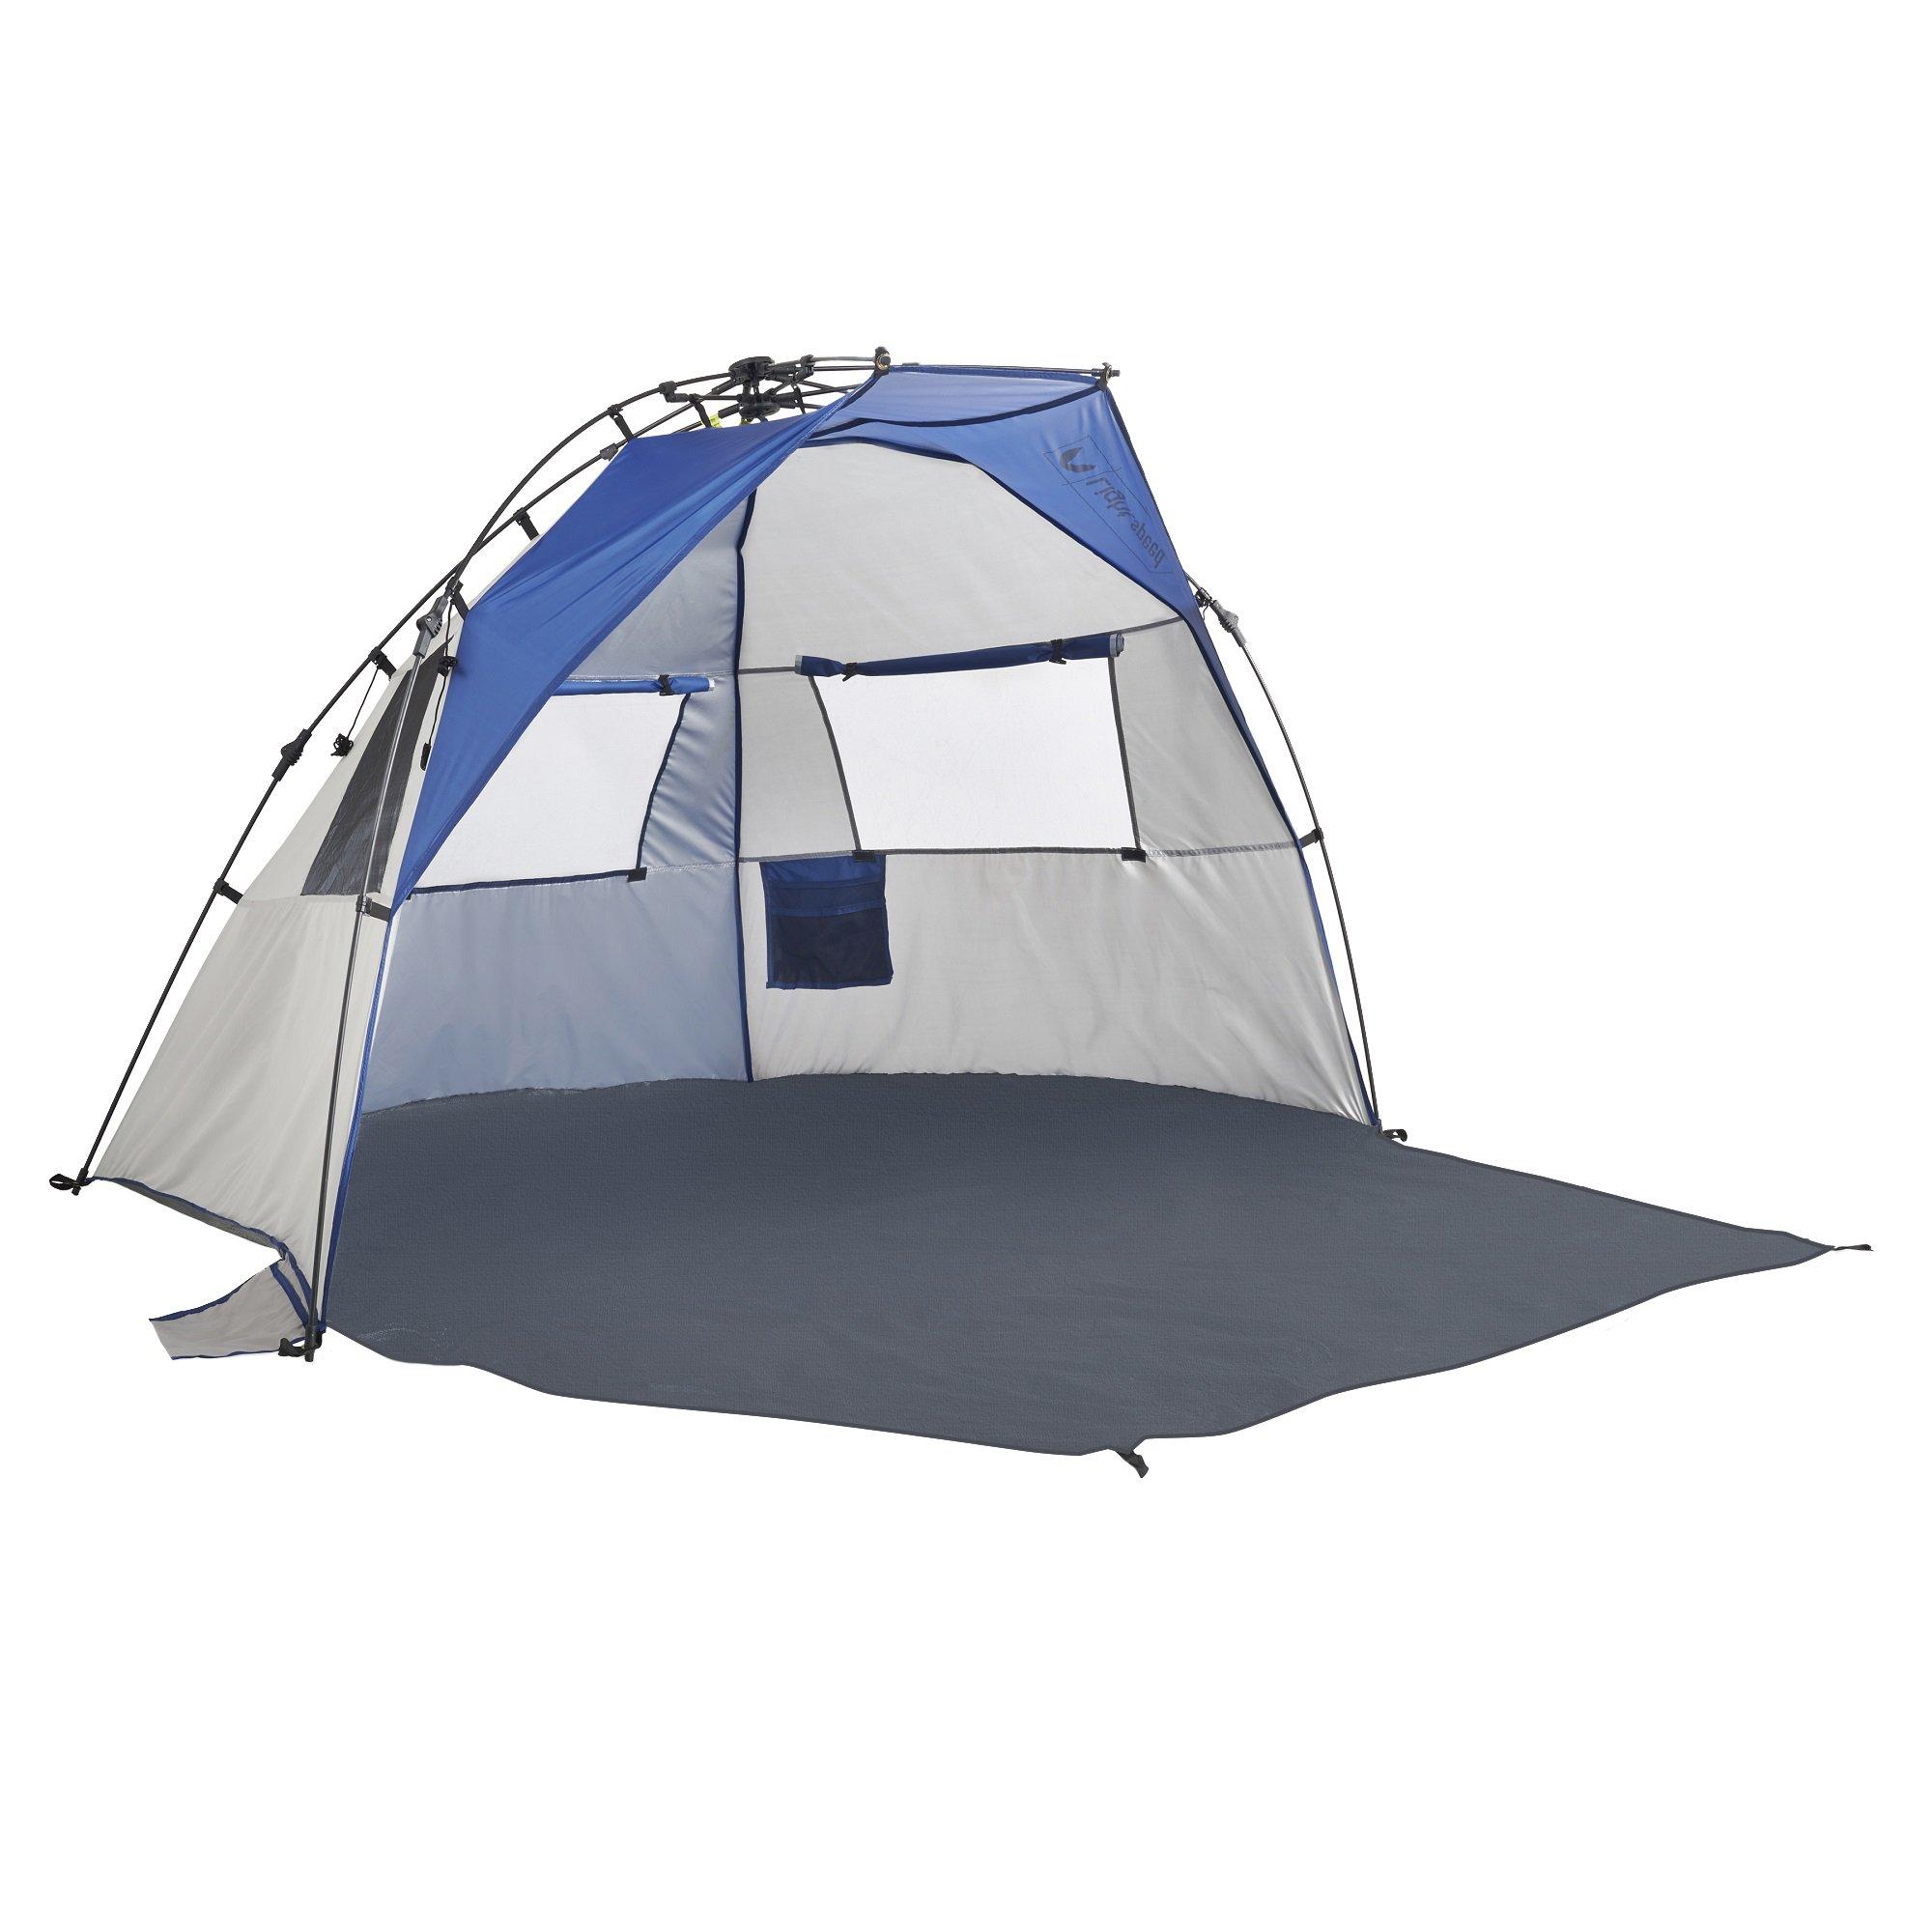 info for efff4 ca5bf Details about Lightspeed Outdoors Quick Cabana Beach Tent Sun Shelter Blue